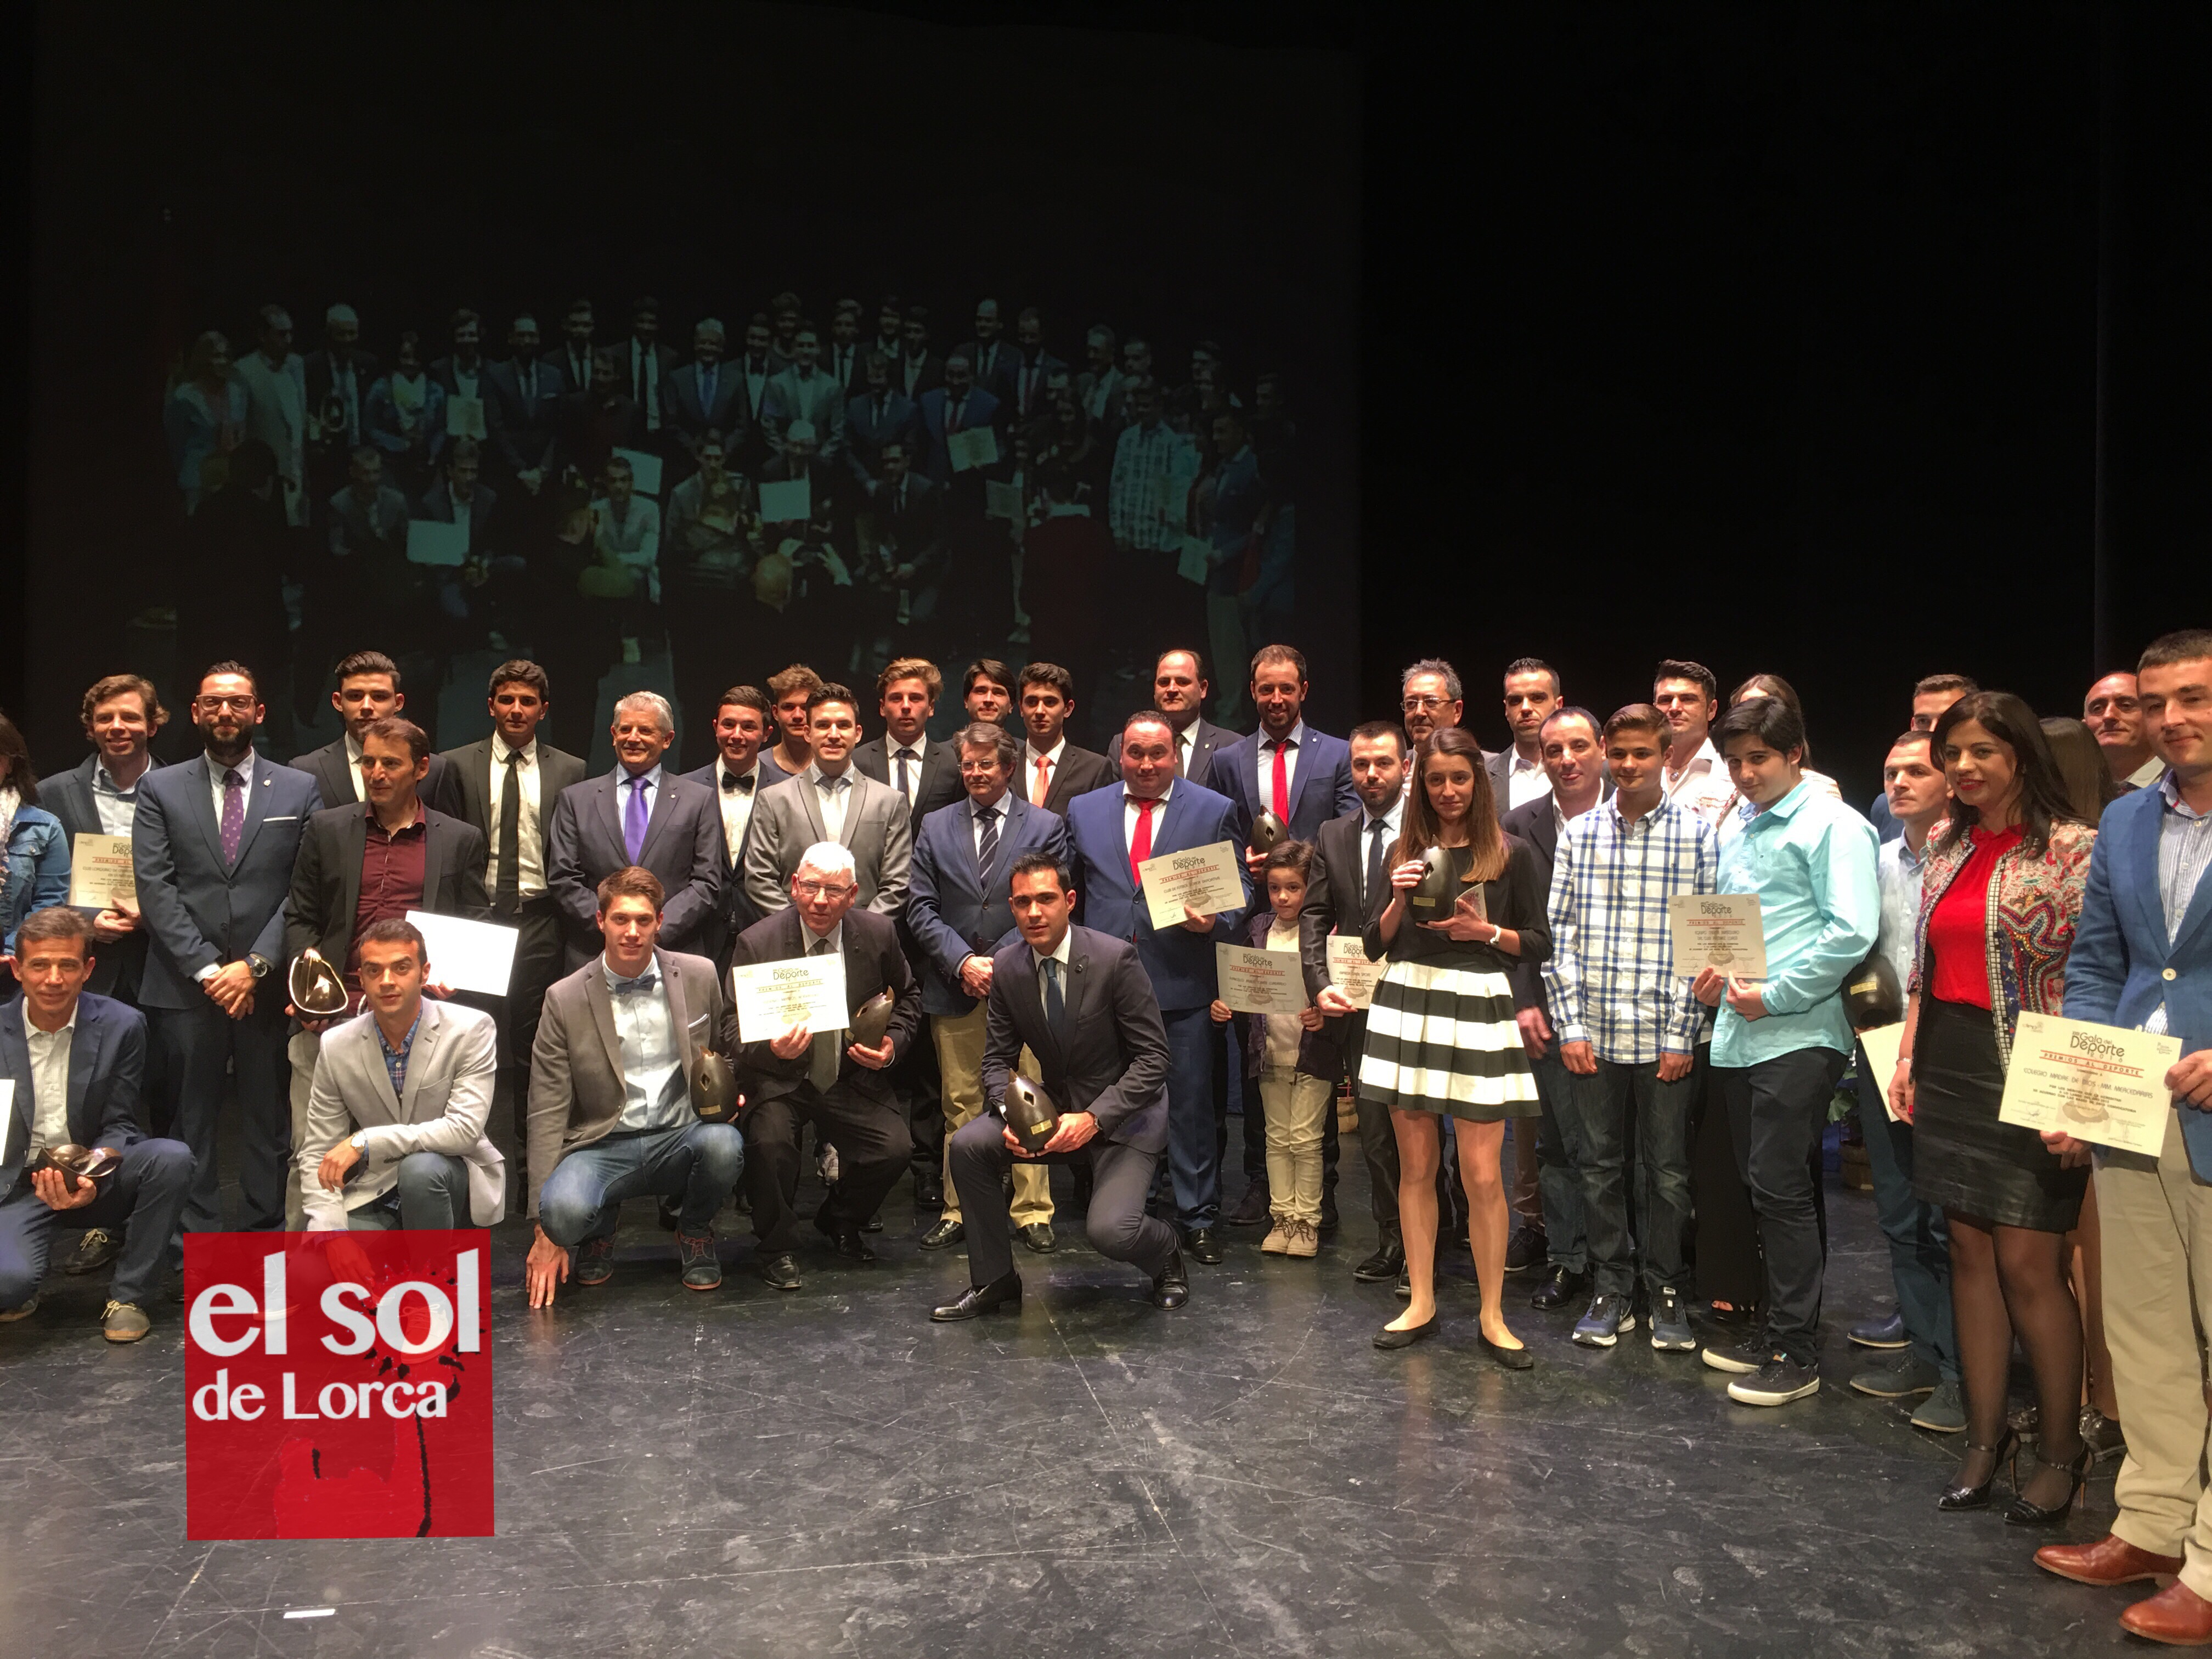 FOTONOTICIA: 'XXII Gala del Deporte de Lorca'